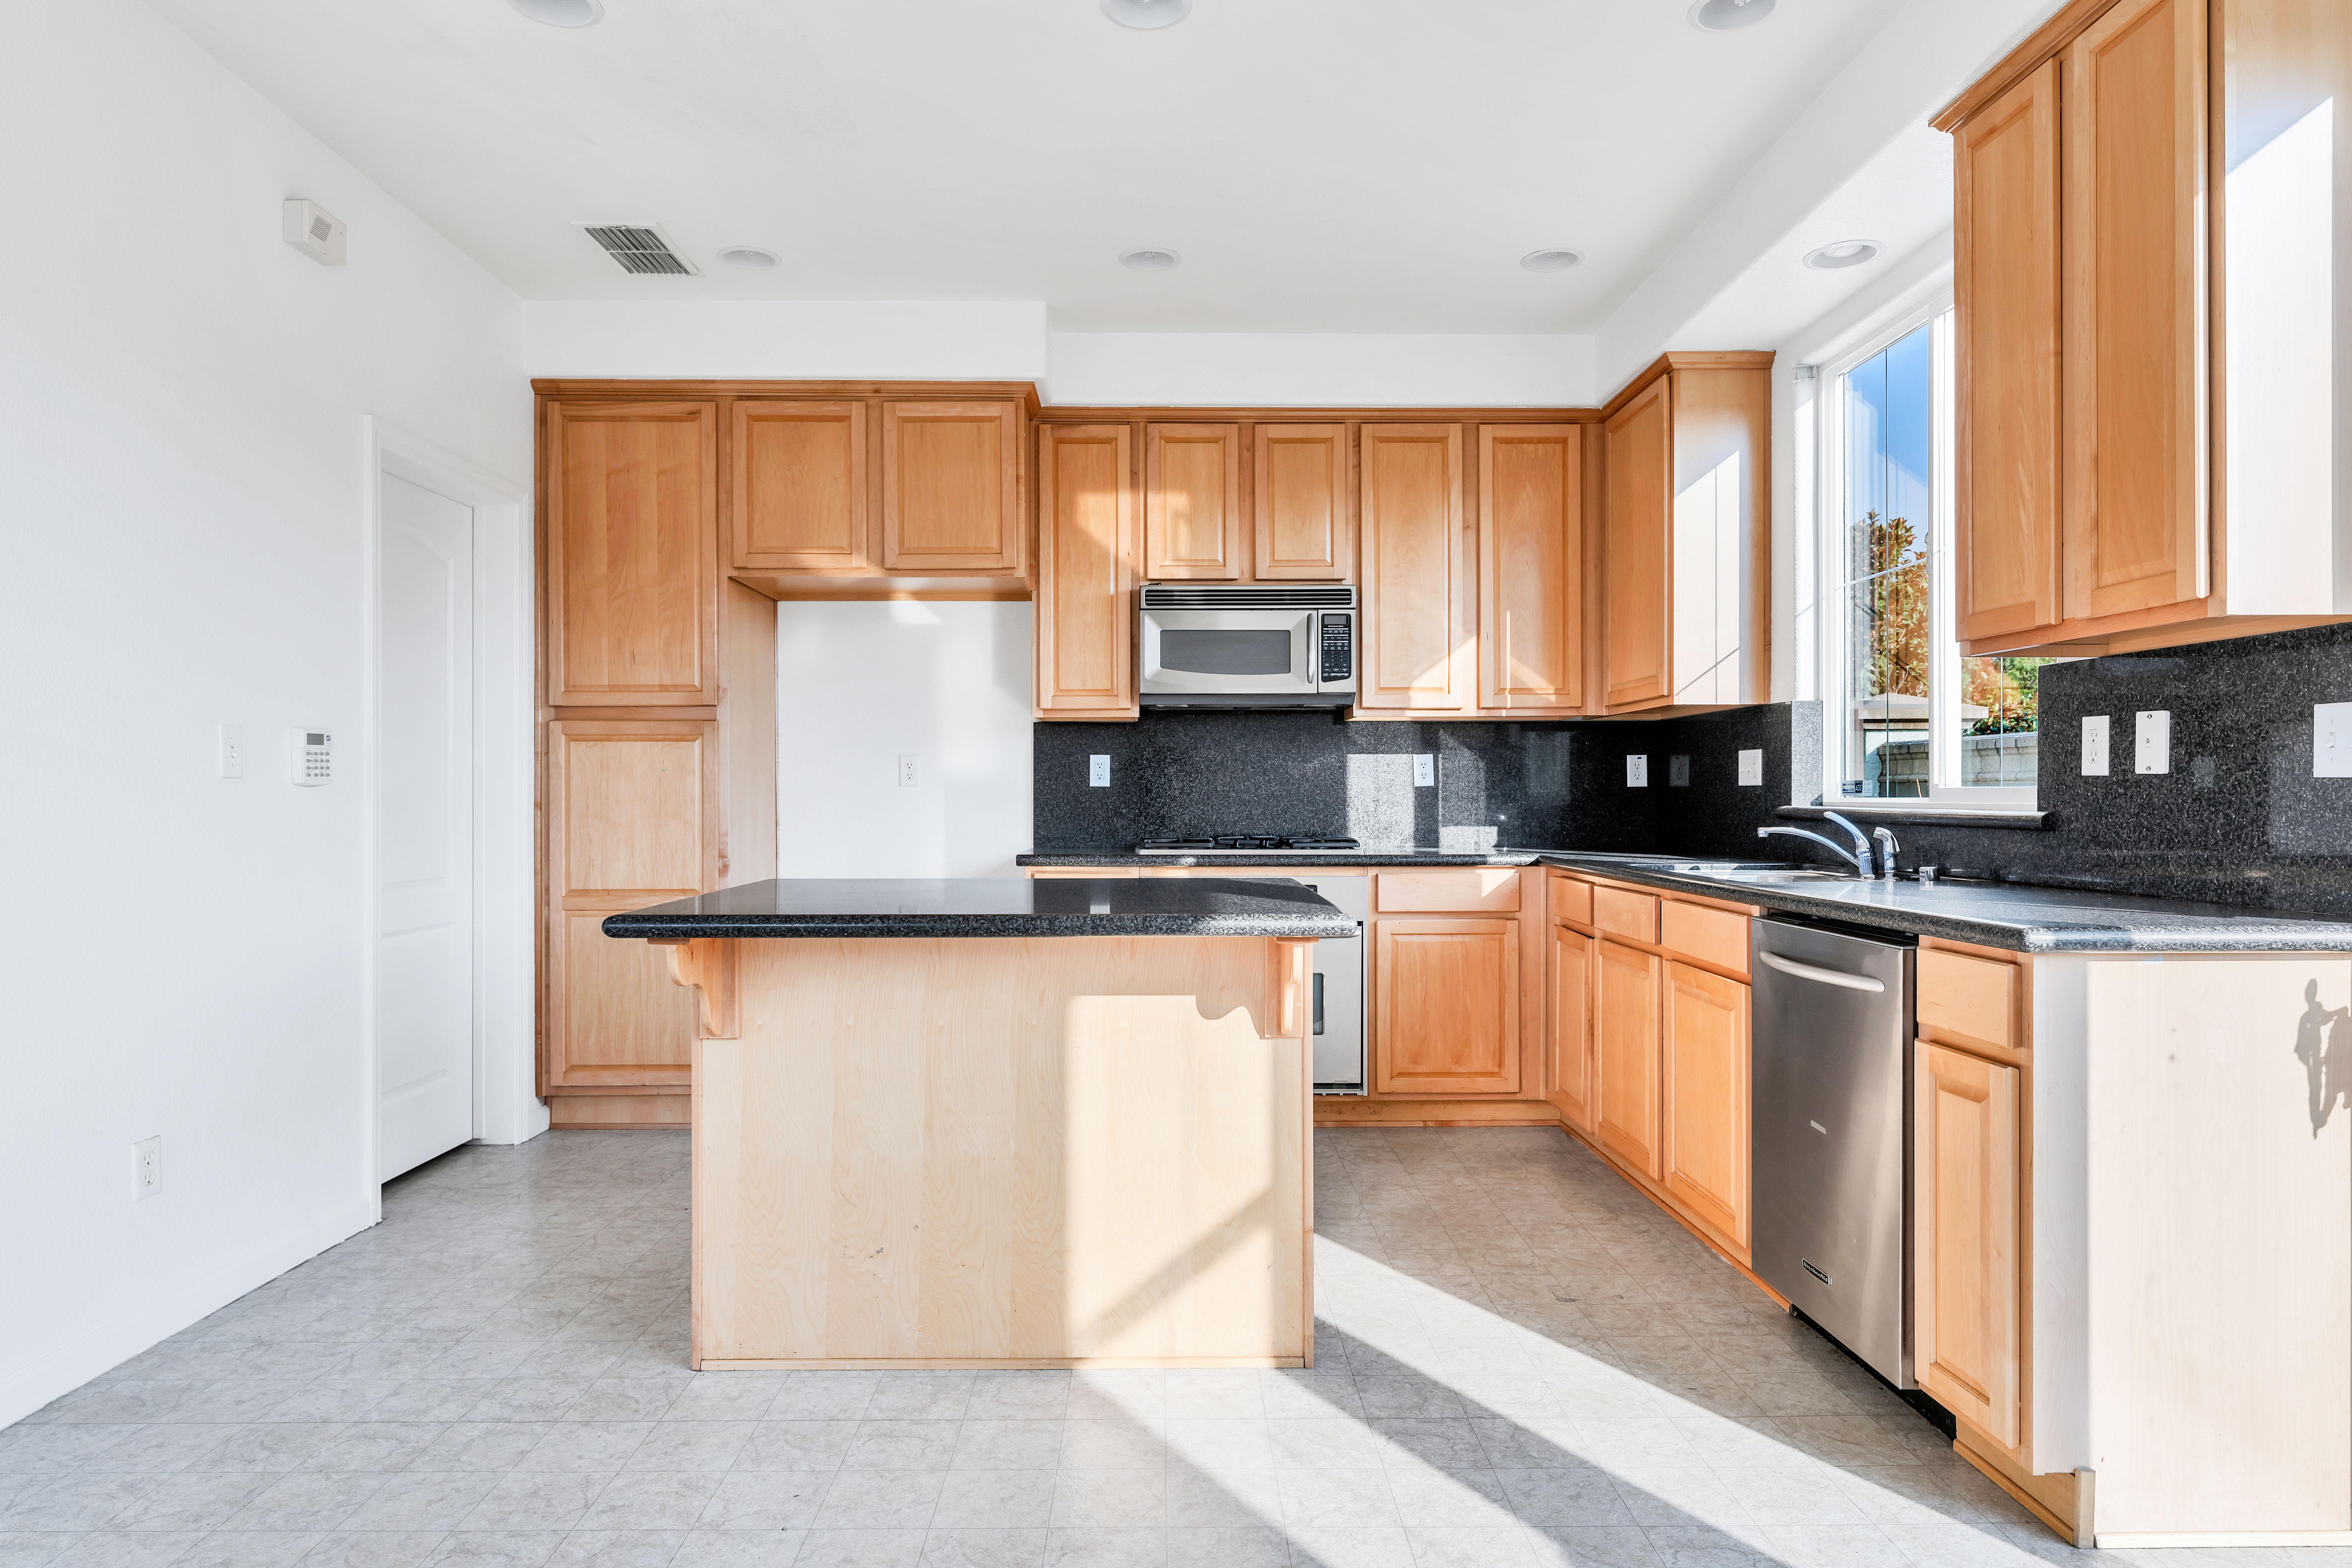 Kitchen of 17 Narwal Pl, Sacramento, Ca 95835